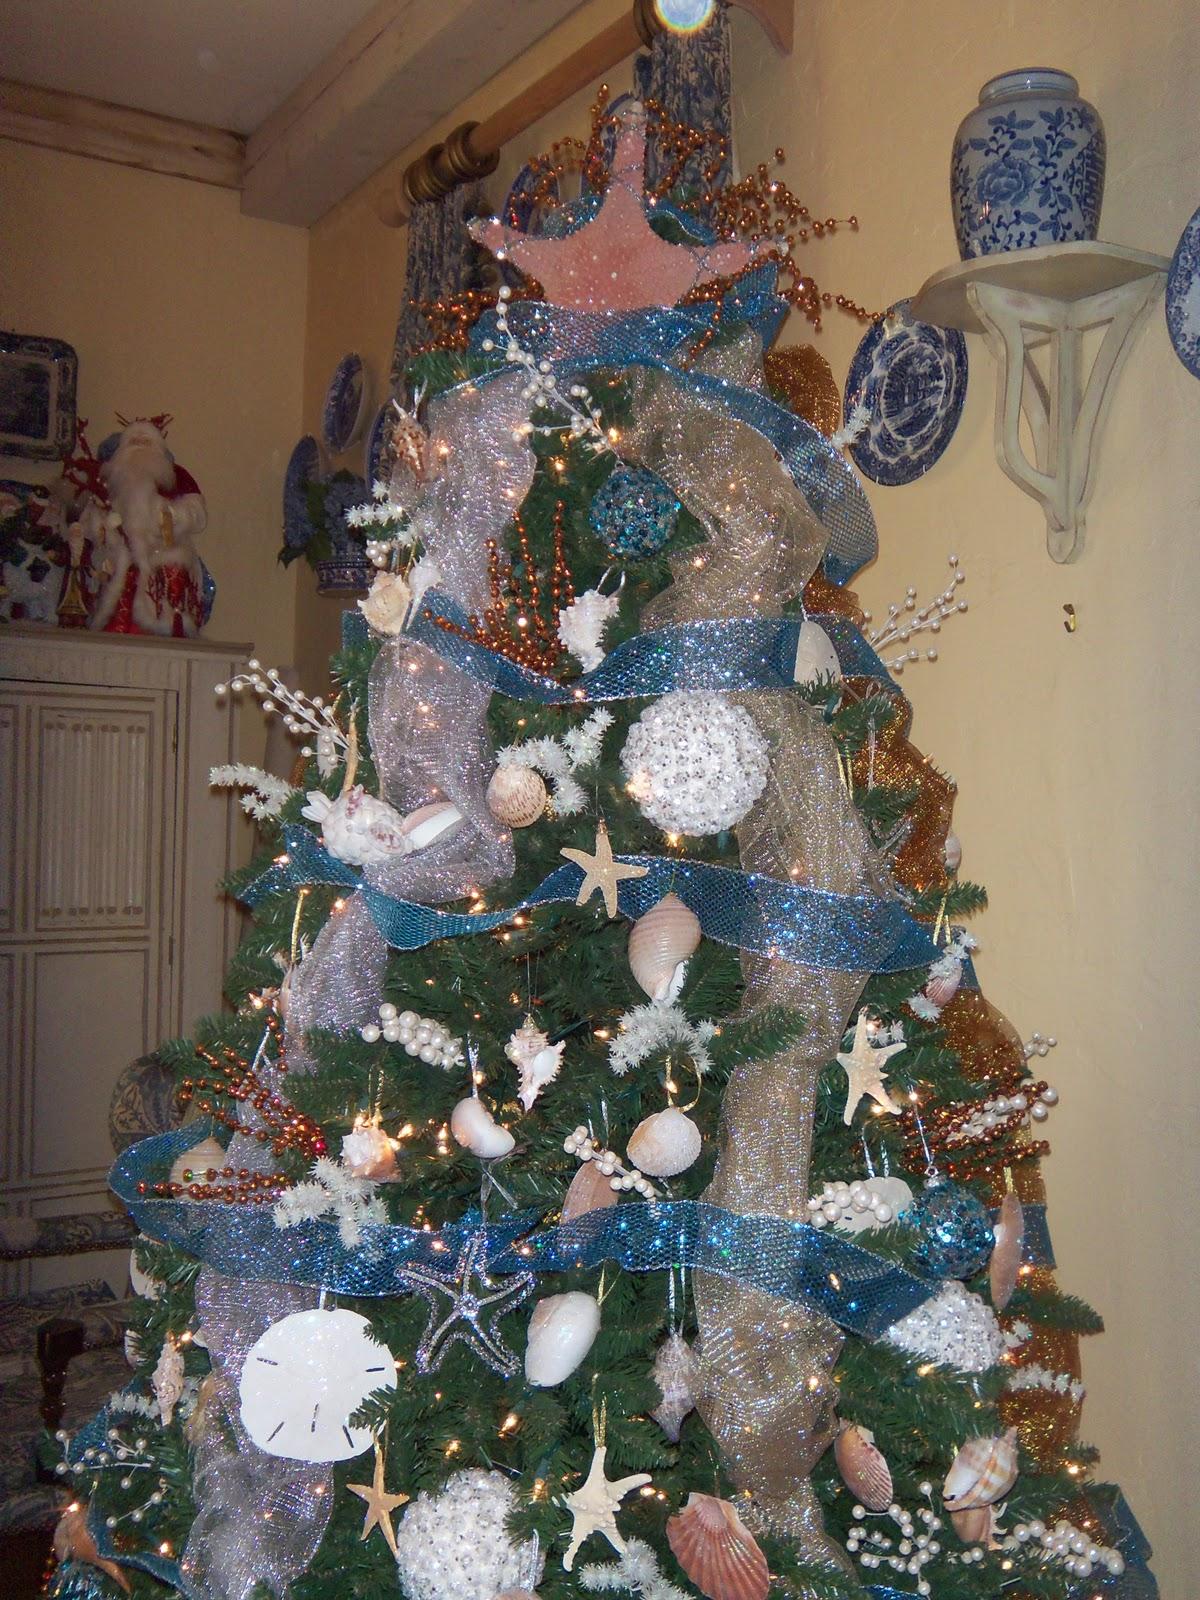 The Posh Pixie: Christmas Trees